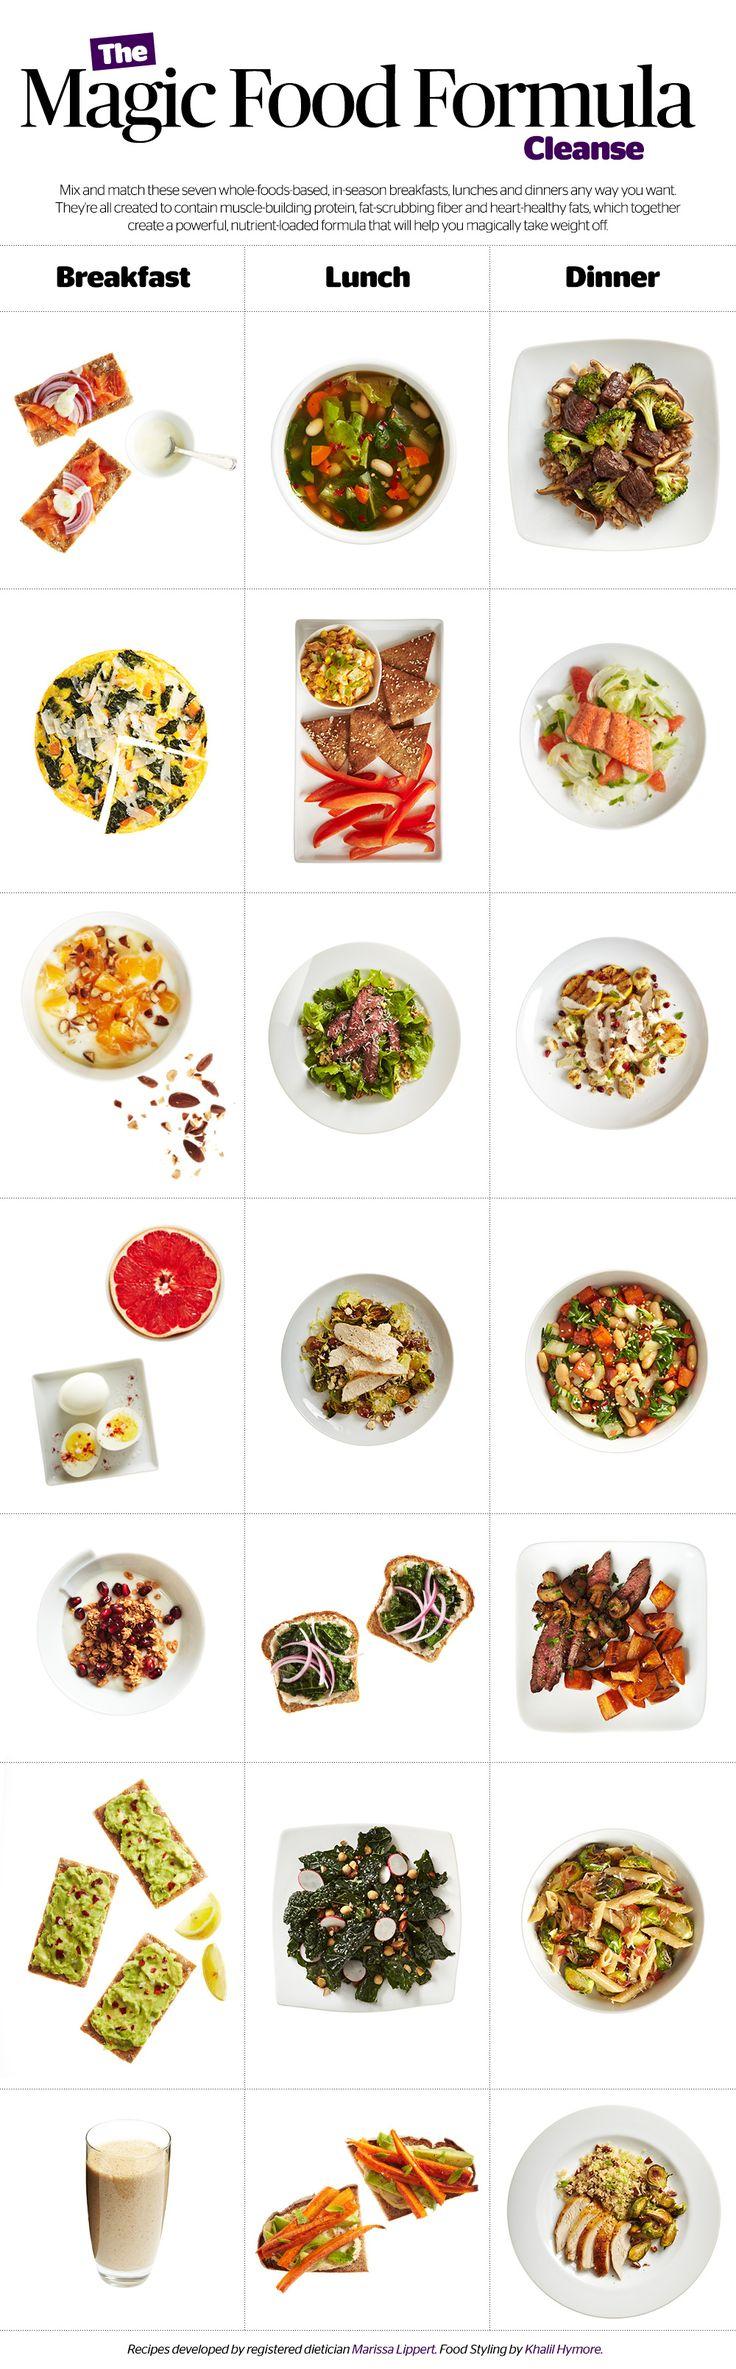 Just the Cleanest Eating You'll EVER Do #питание #фитнес #спорт #диета #похудение #KrasotkaPro #diet #slimming #еда #здоровье